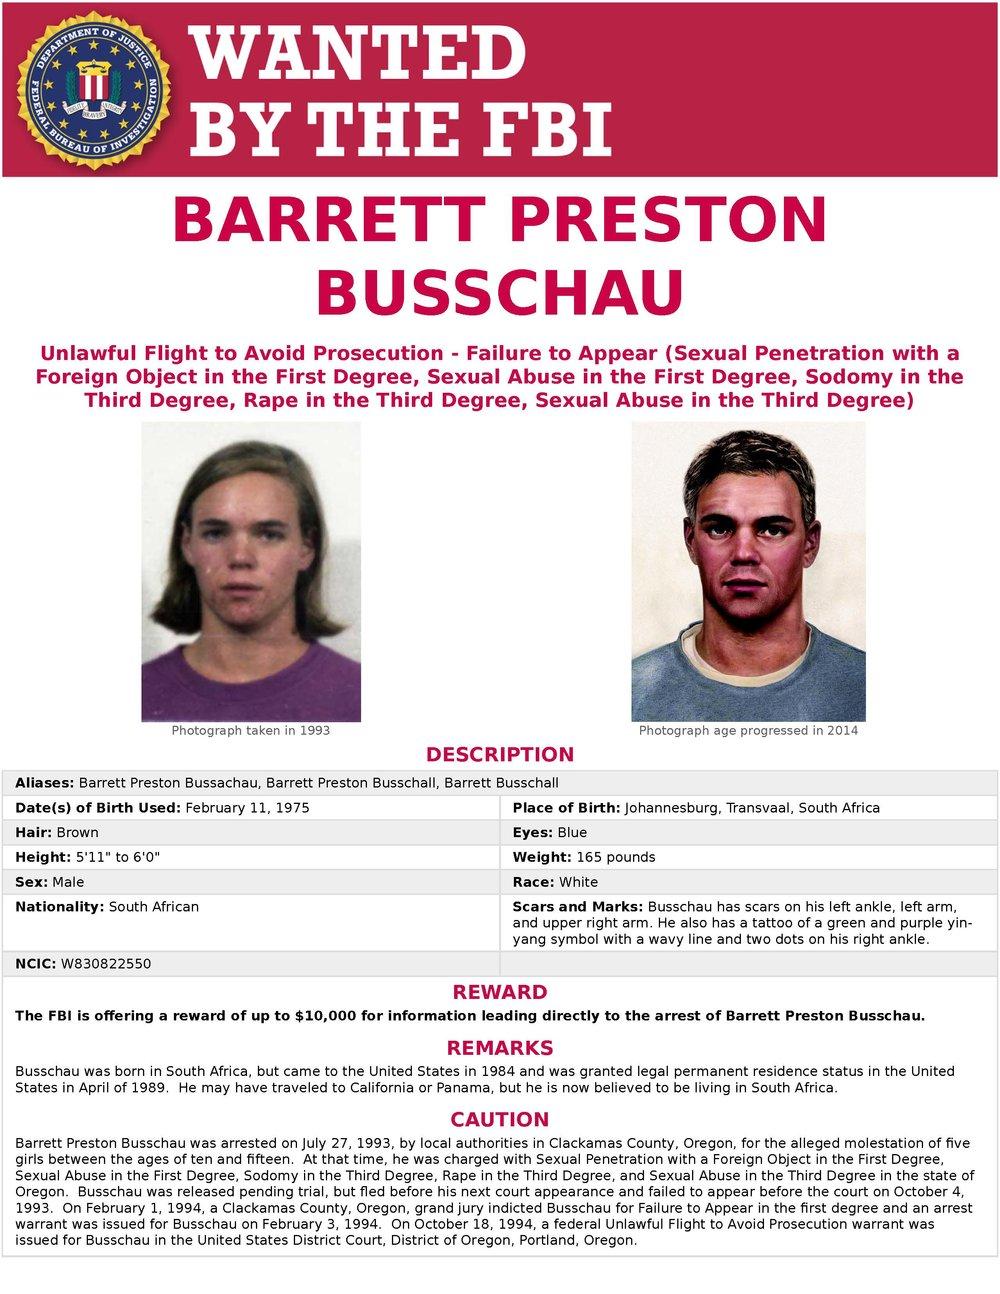 barrett-preston-busschau_FBI_Wanted_poster_-_January_2018_Page_1.jpg